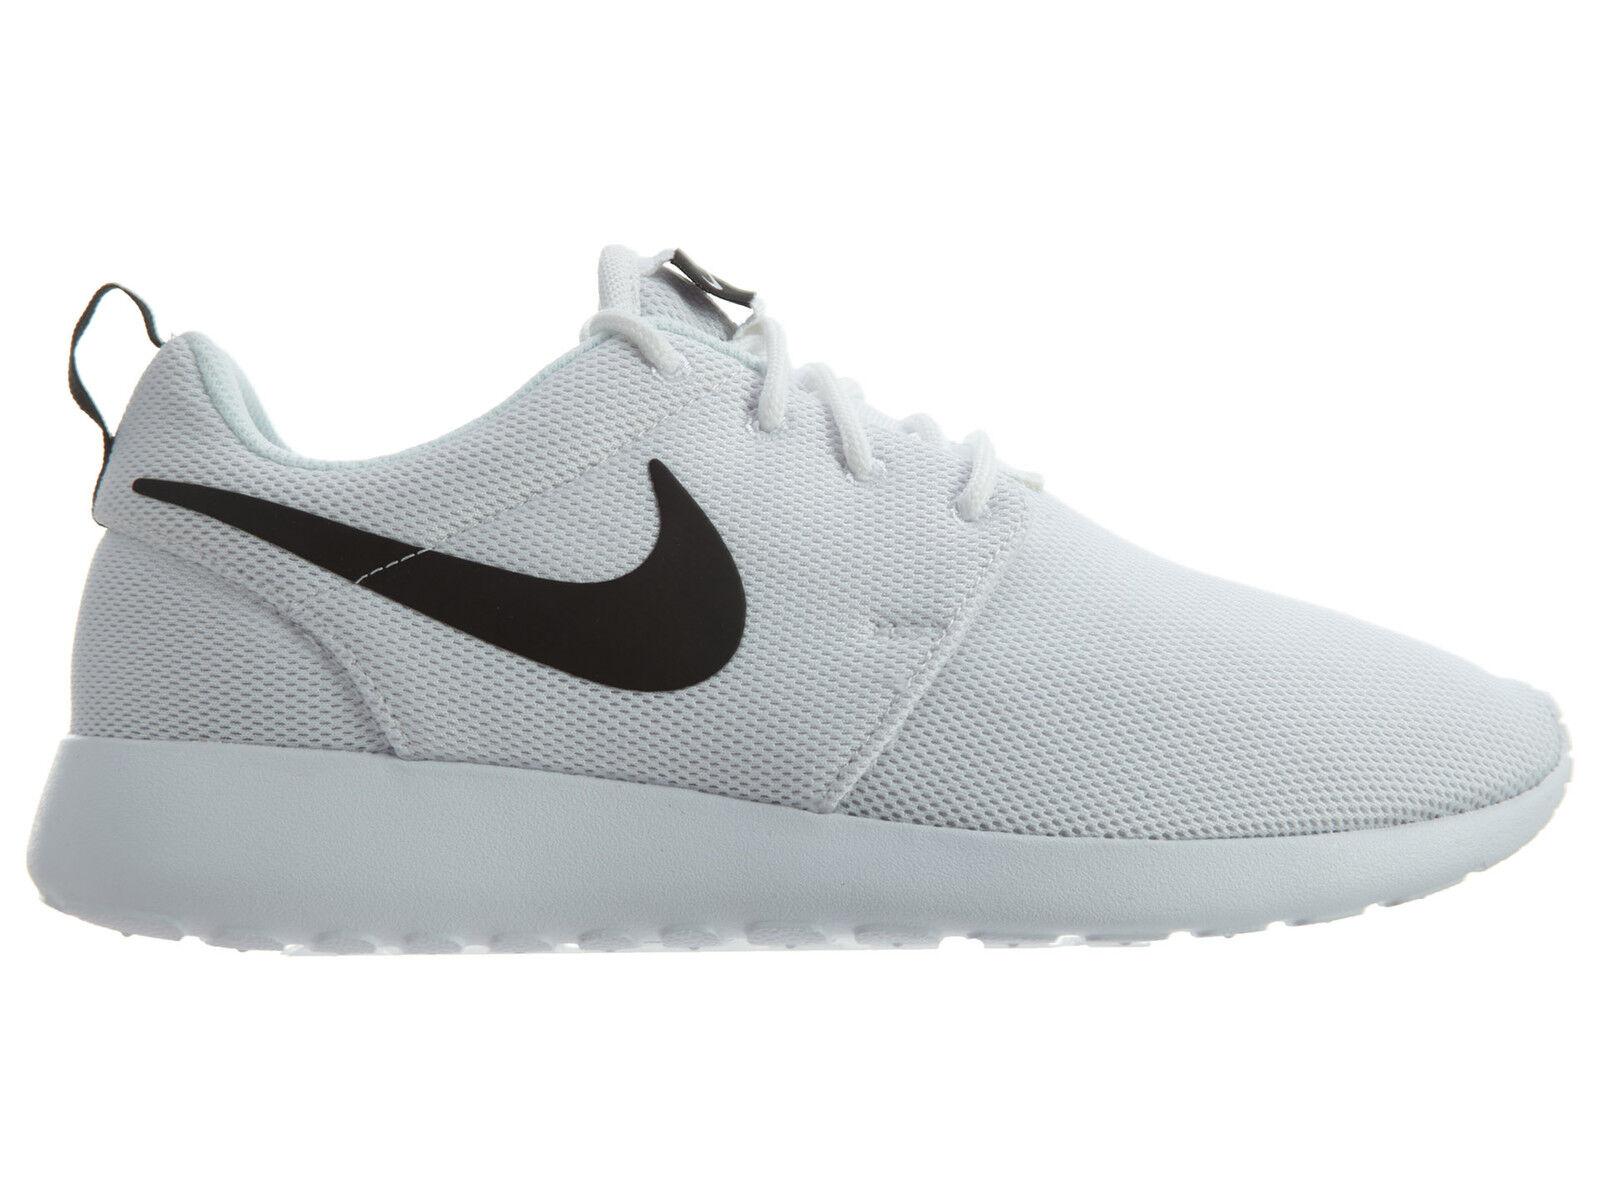 Nike Roshe One Womens 844994-101 White Black Mesh Running Shoes Wmns Size 8.5